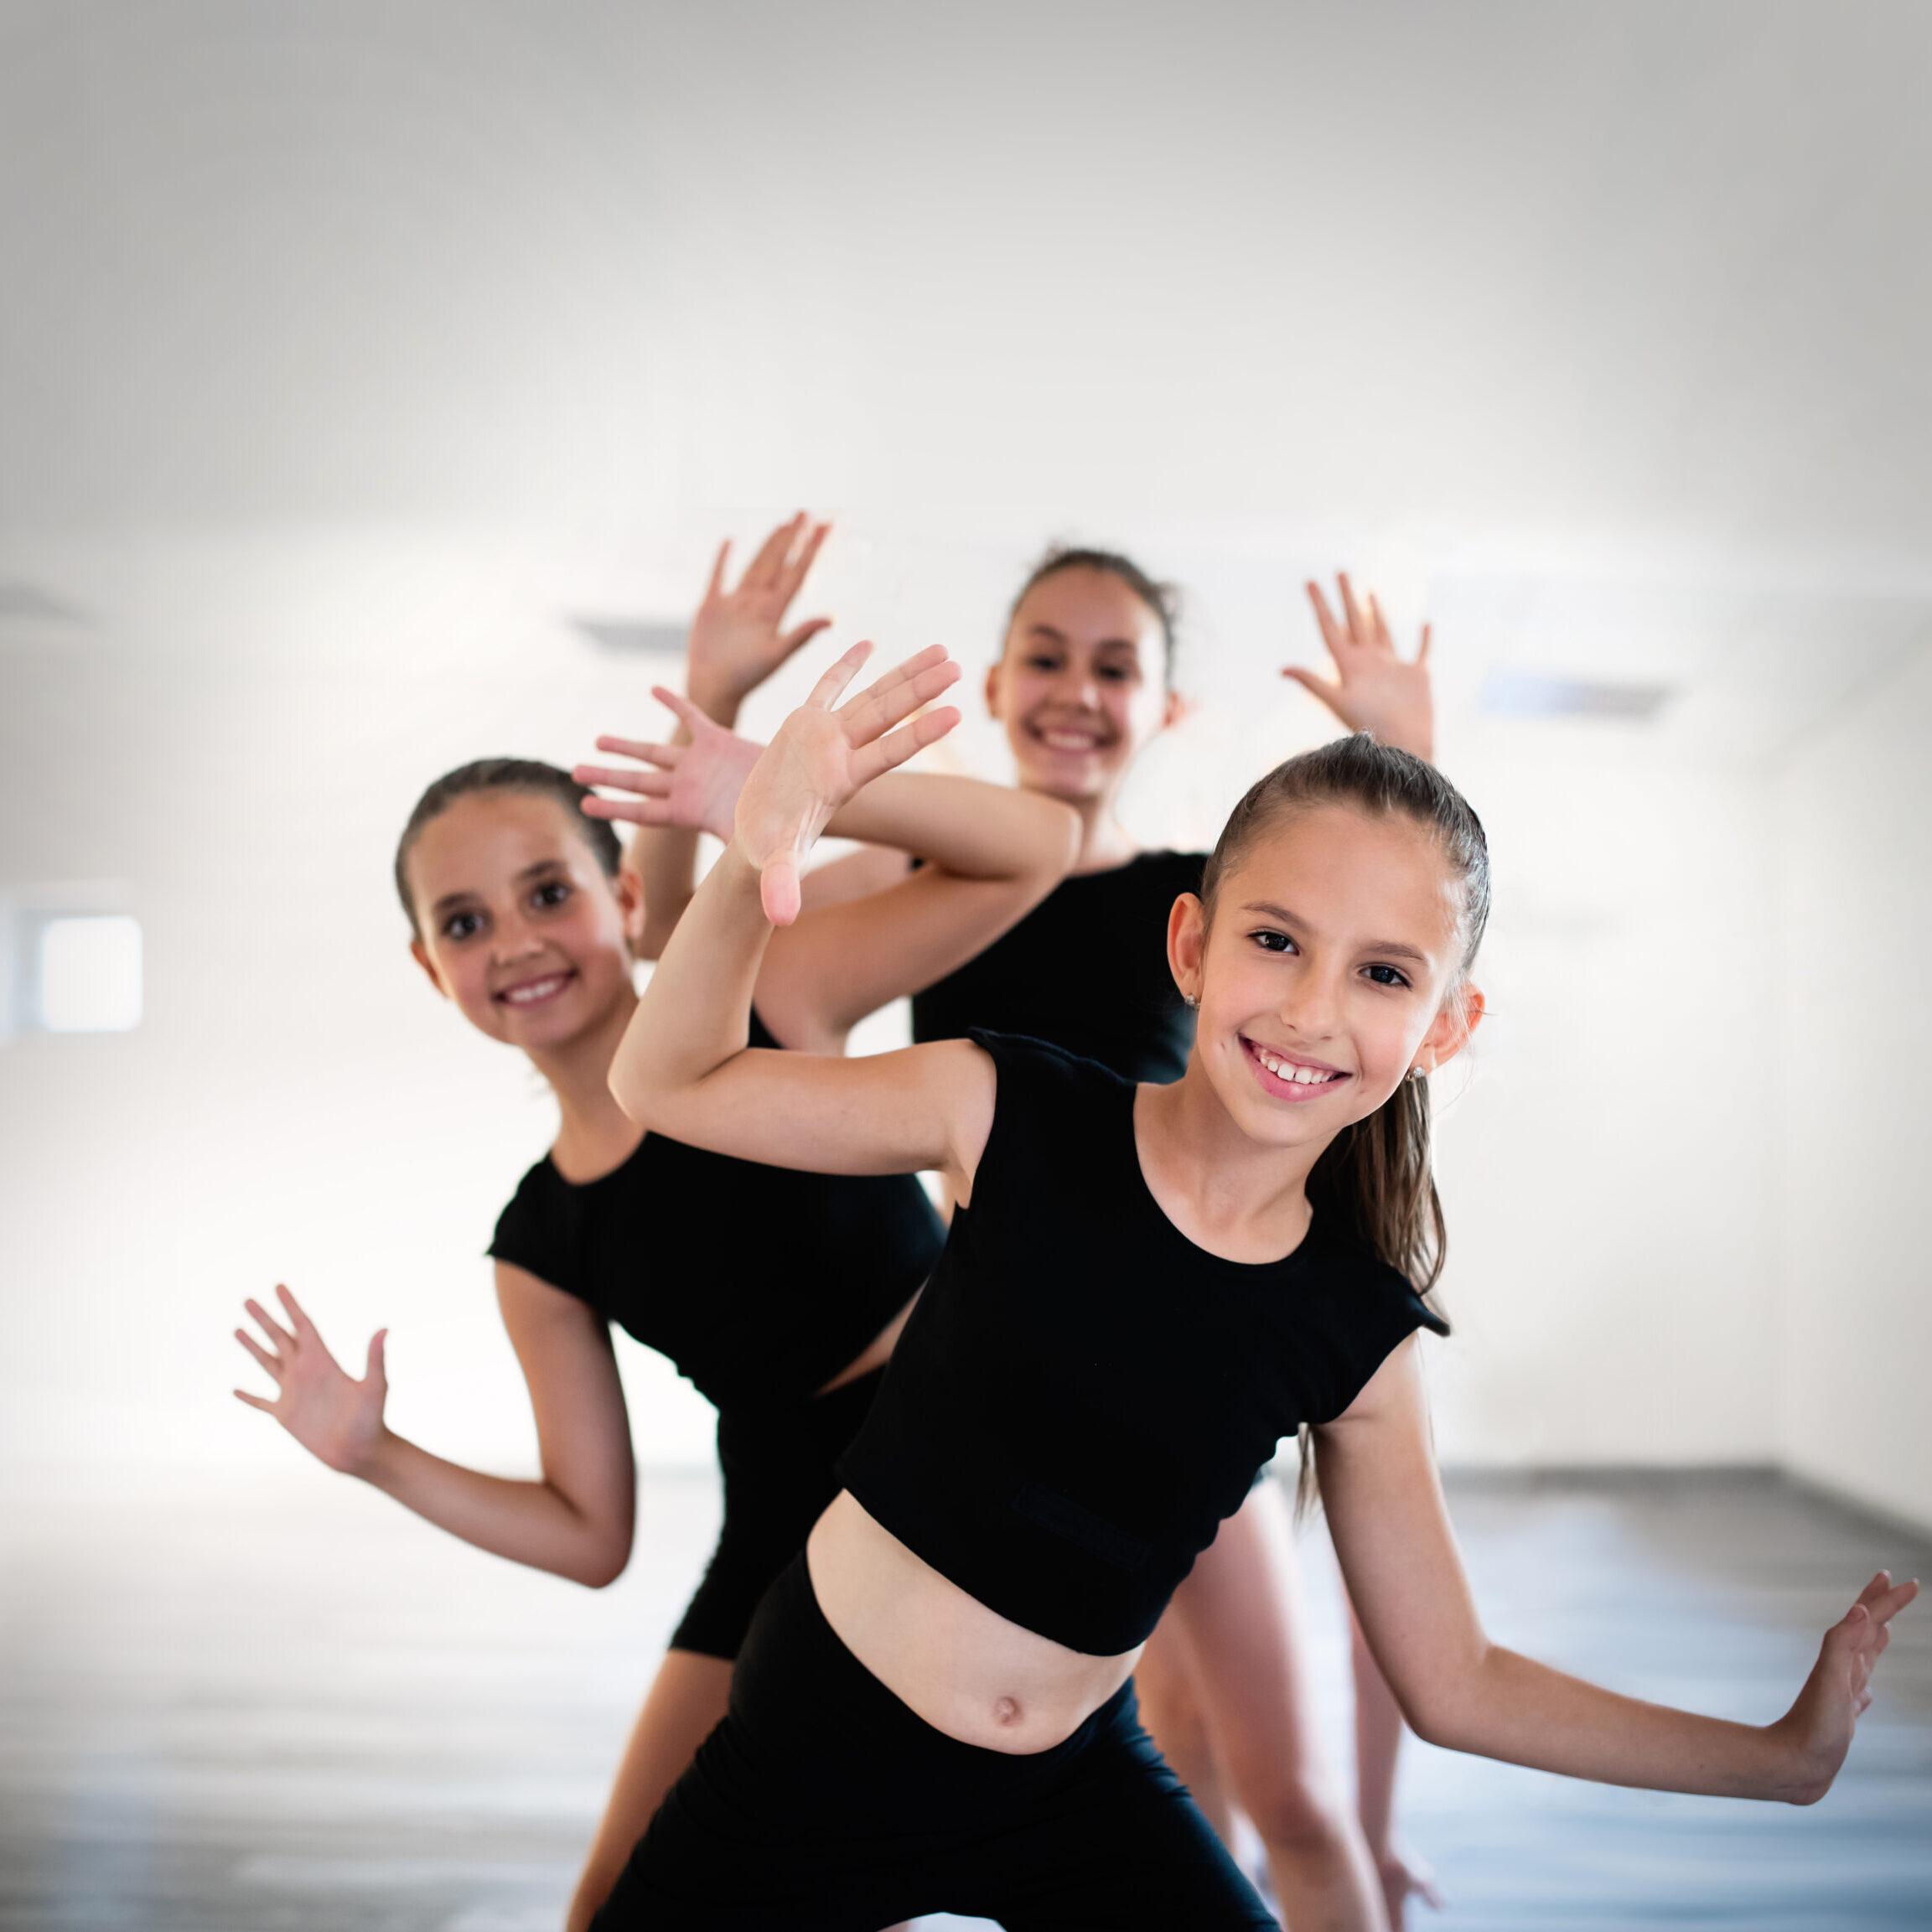 Group of fit children exercising ballet in studio together